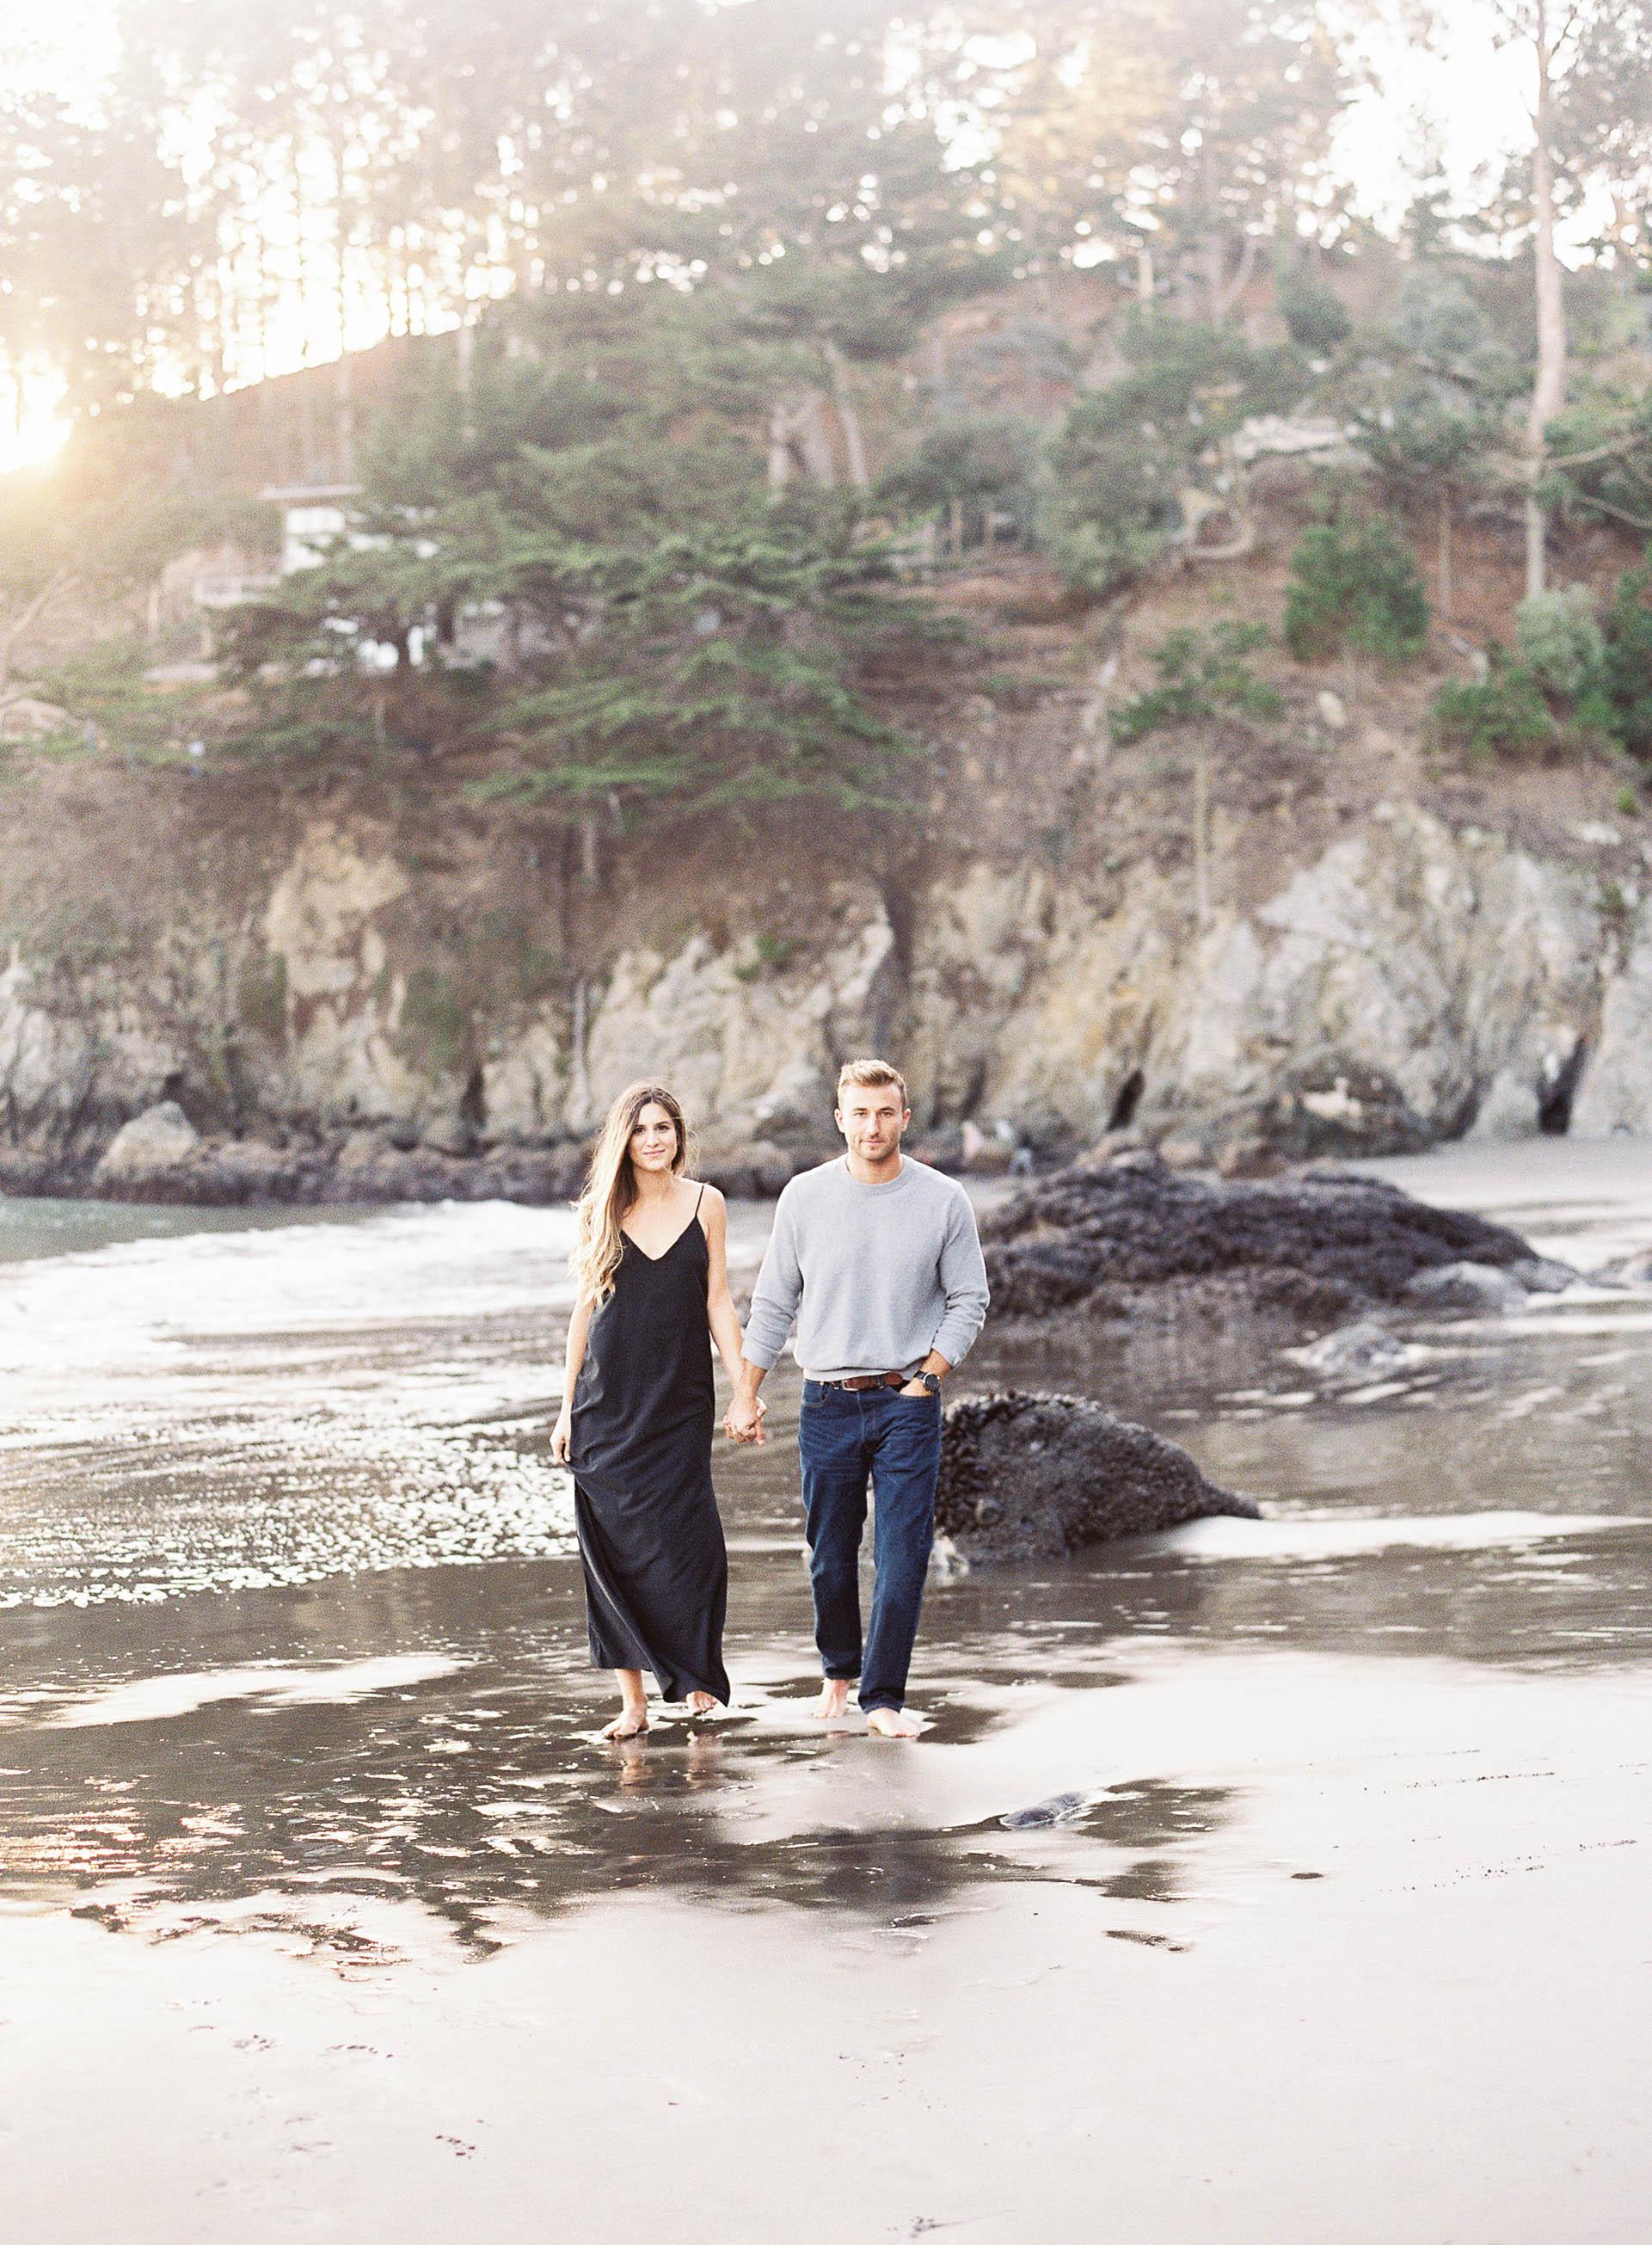 Meghan Mehan Photography - Fine Art Film Wedding Photography - San Francisco | Napa | Sonoma | Big Sur | Chicago | Minneapolis | Milwaukee | Lake Geneva | Door County | Wisconsin 008.jpg